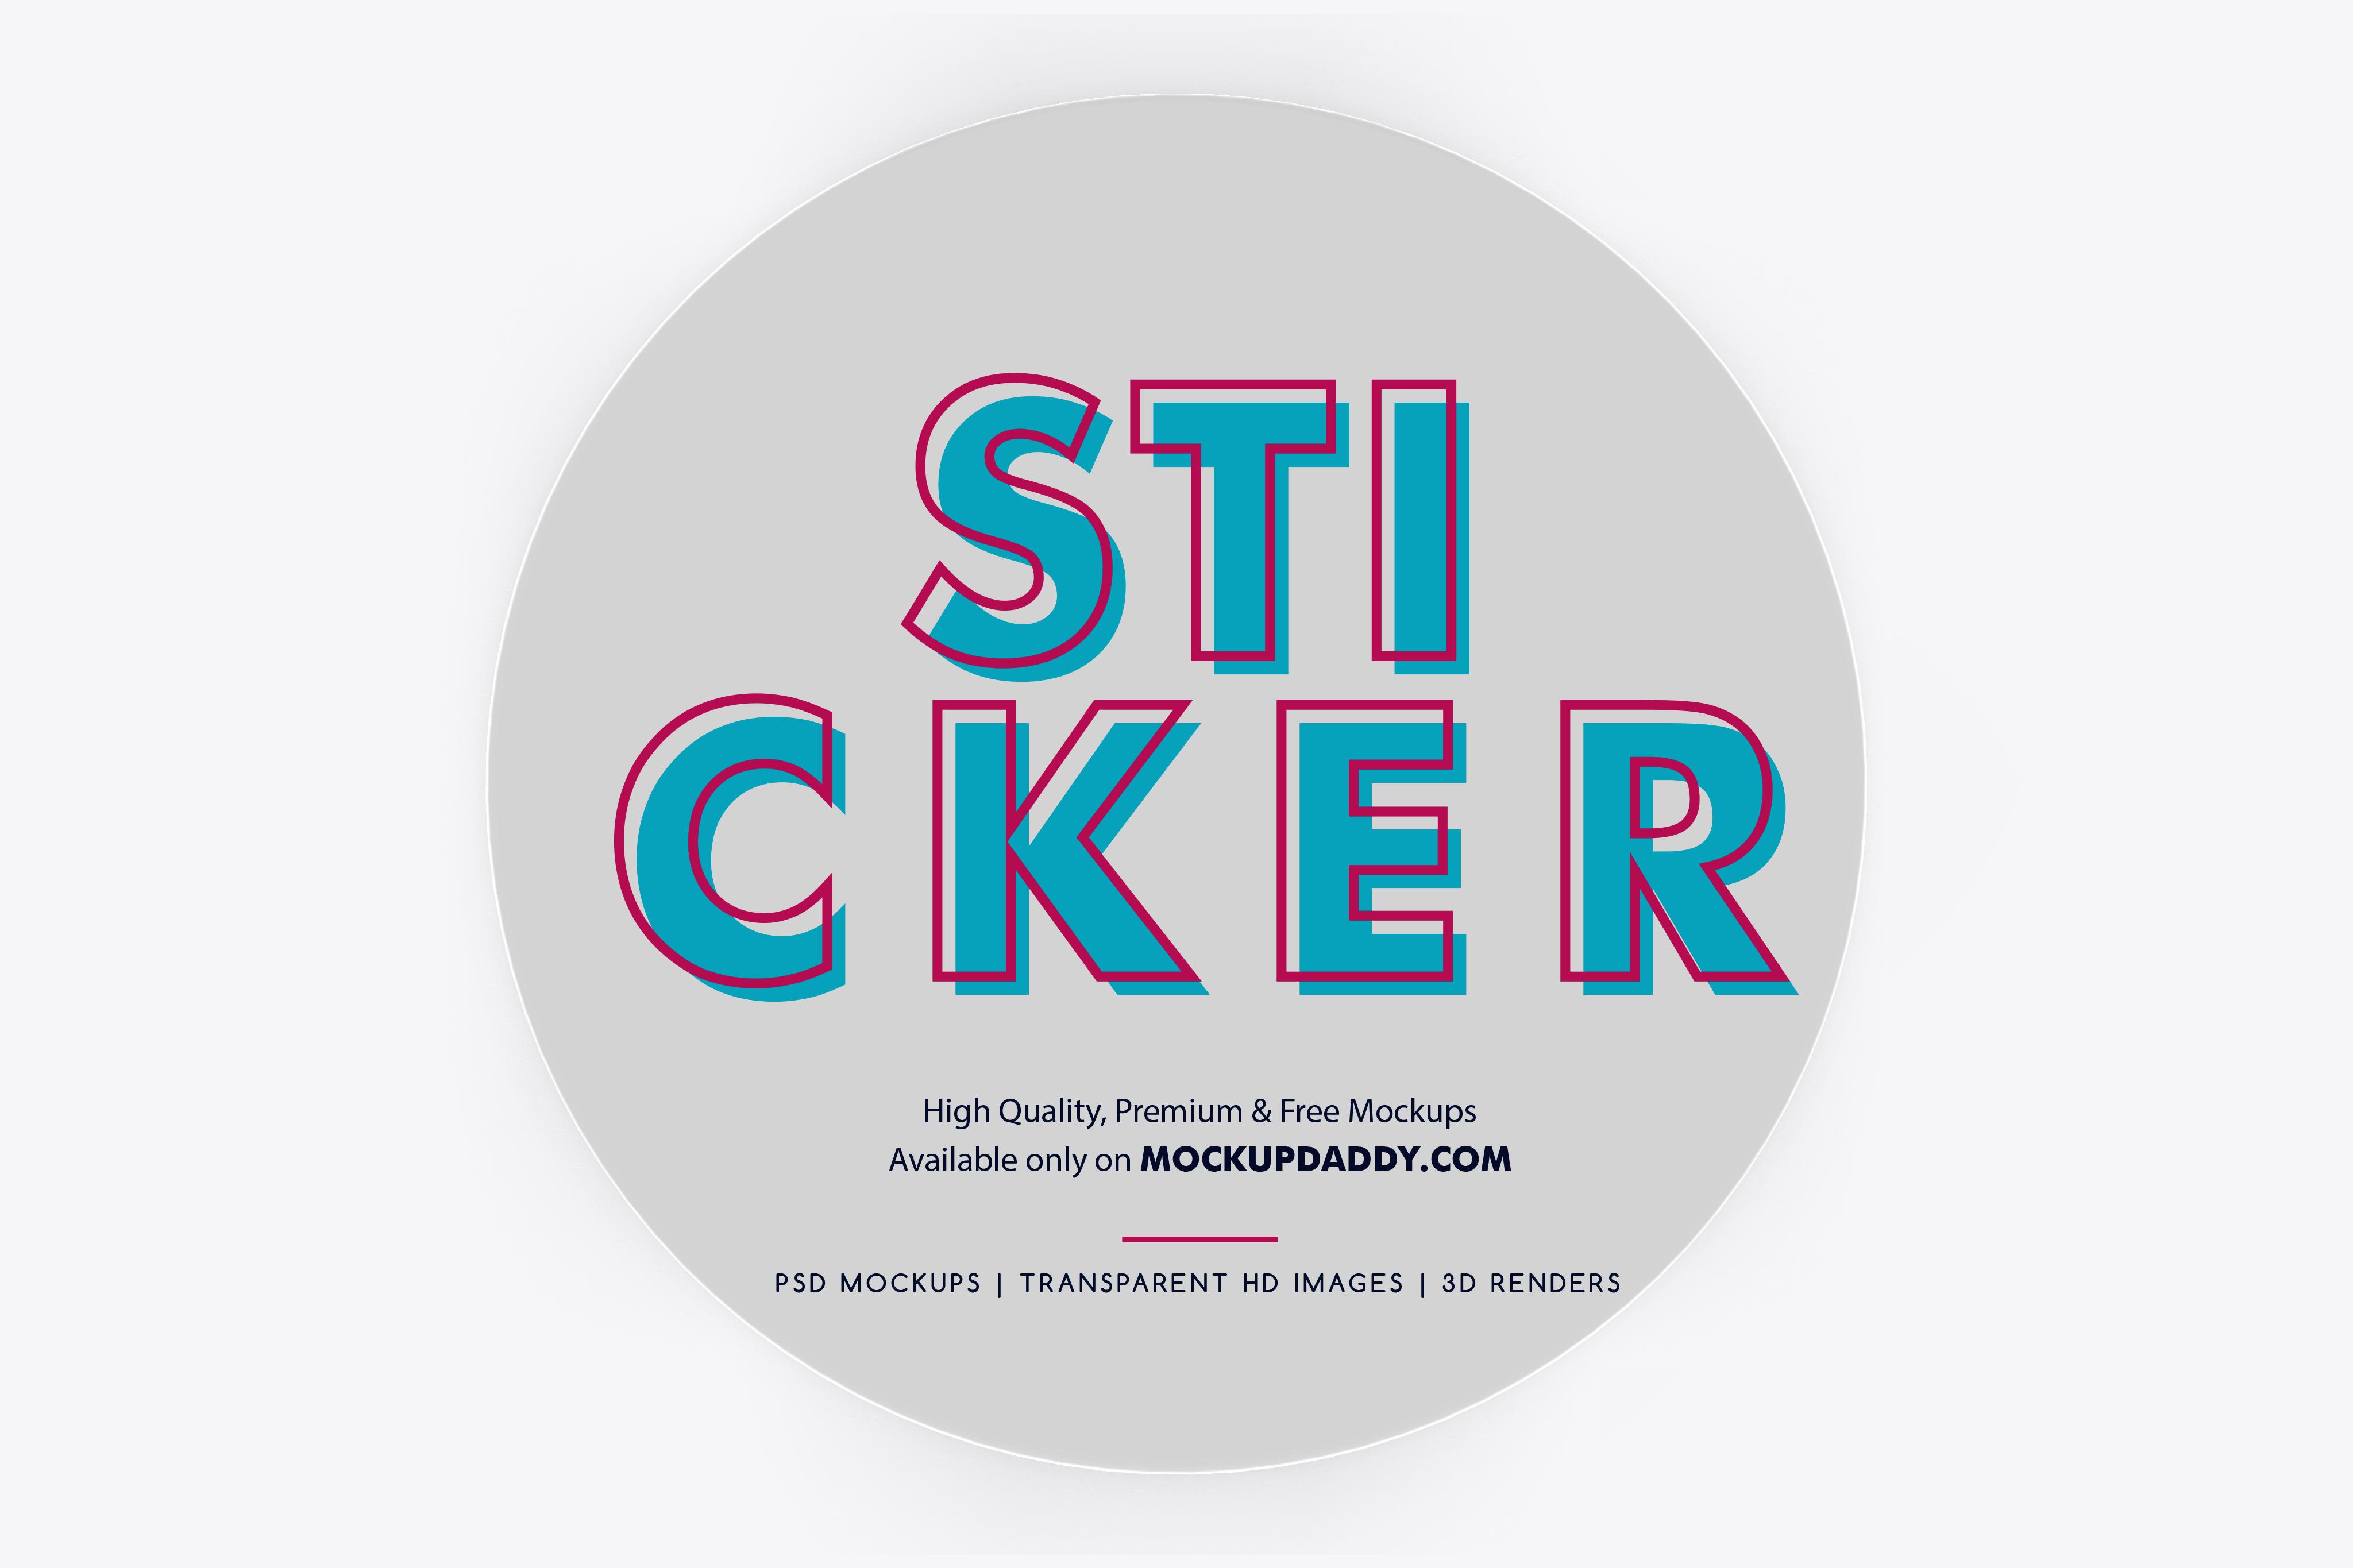 Round Adhesive Sticker Mockup - Mockup Daddy